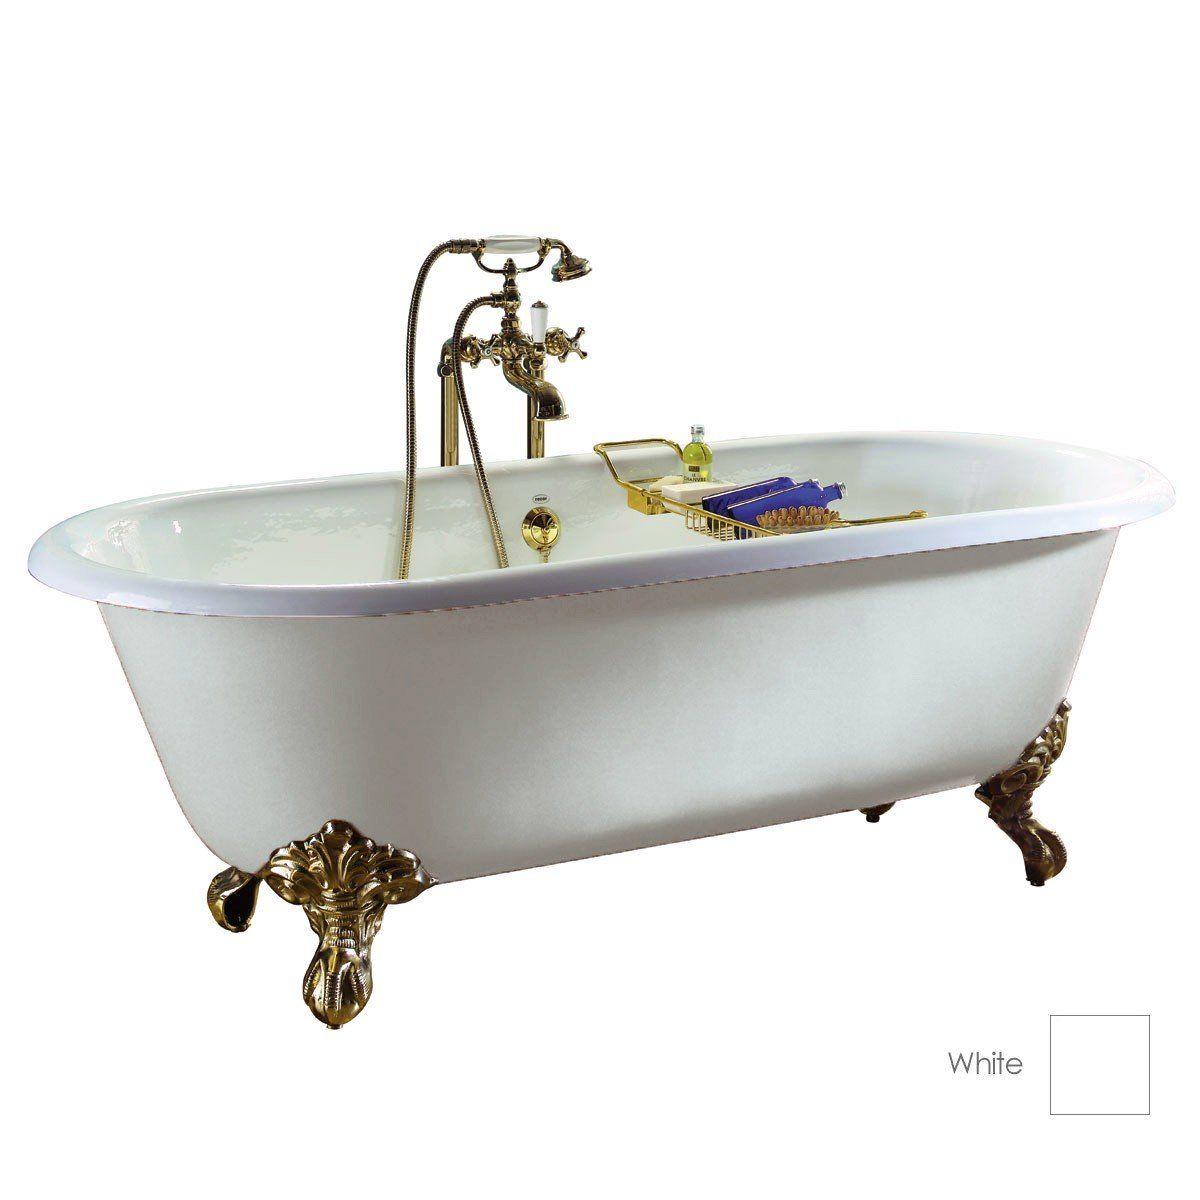 Bella Casa 61 In Double Ended Bathtub - No Drillings 14 3/5 in water ...